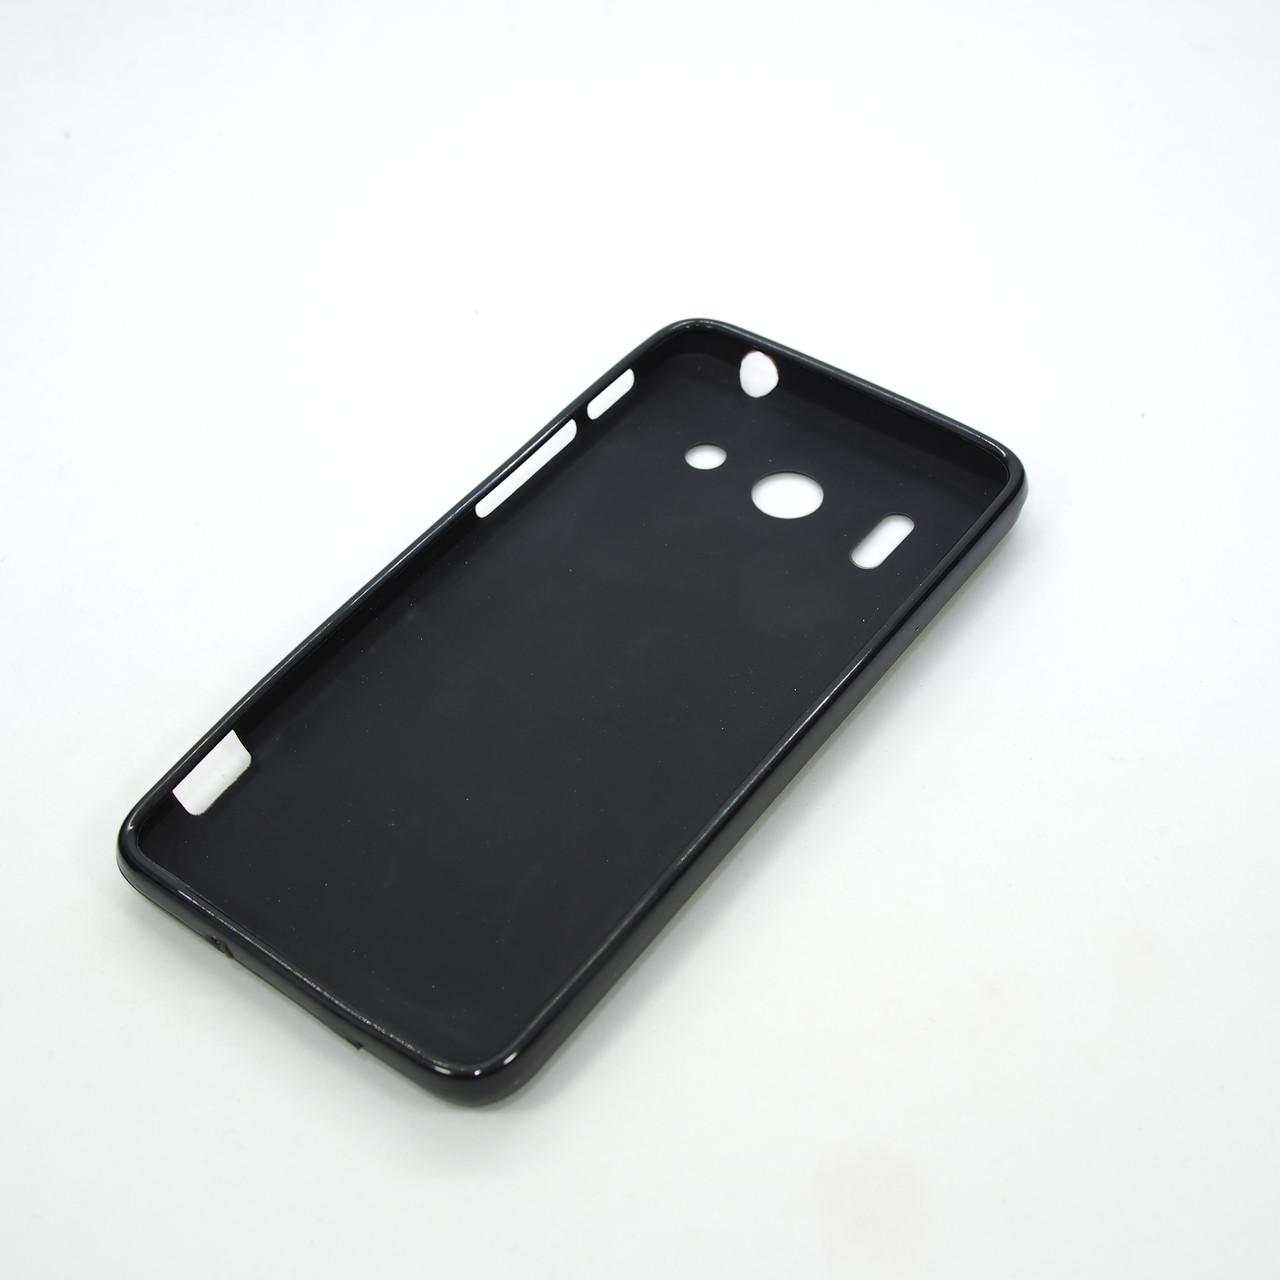 Чехлы для Huawei TPU Ascend G510 U8951 black Для телефона